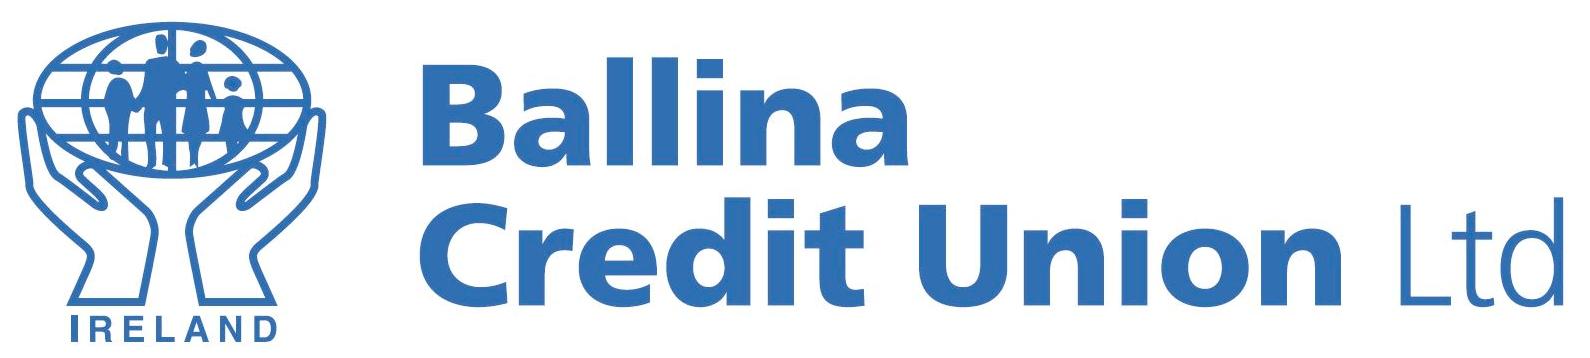 ballina_logo